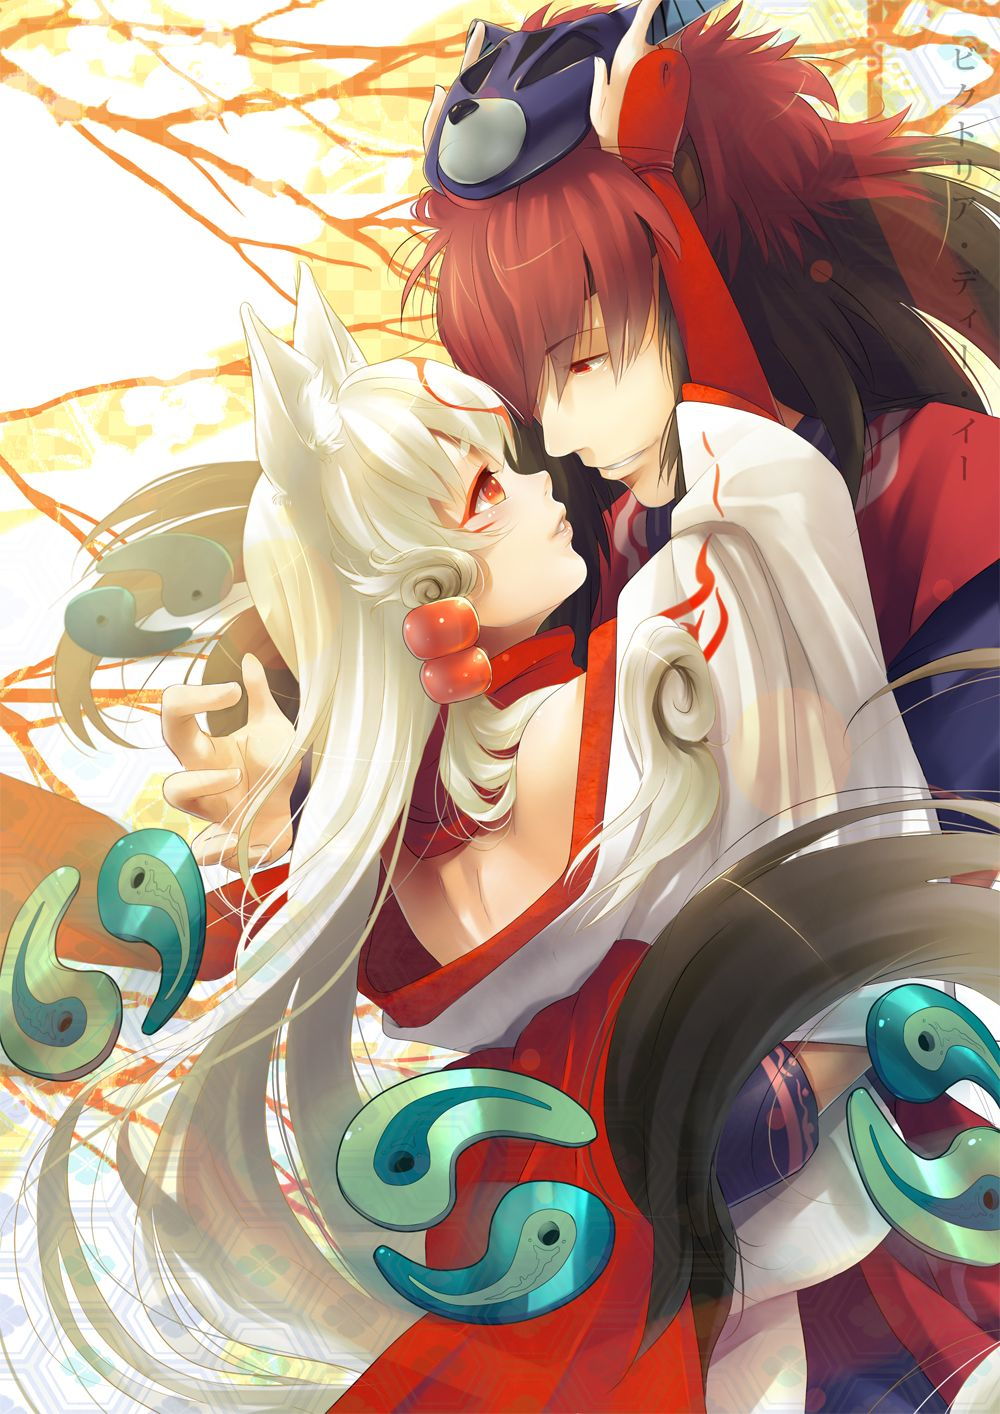 Amaterasu and Oki by kotorikurama.deviantart.com on @DeviantArt